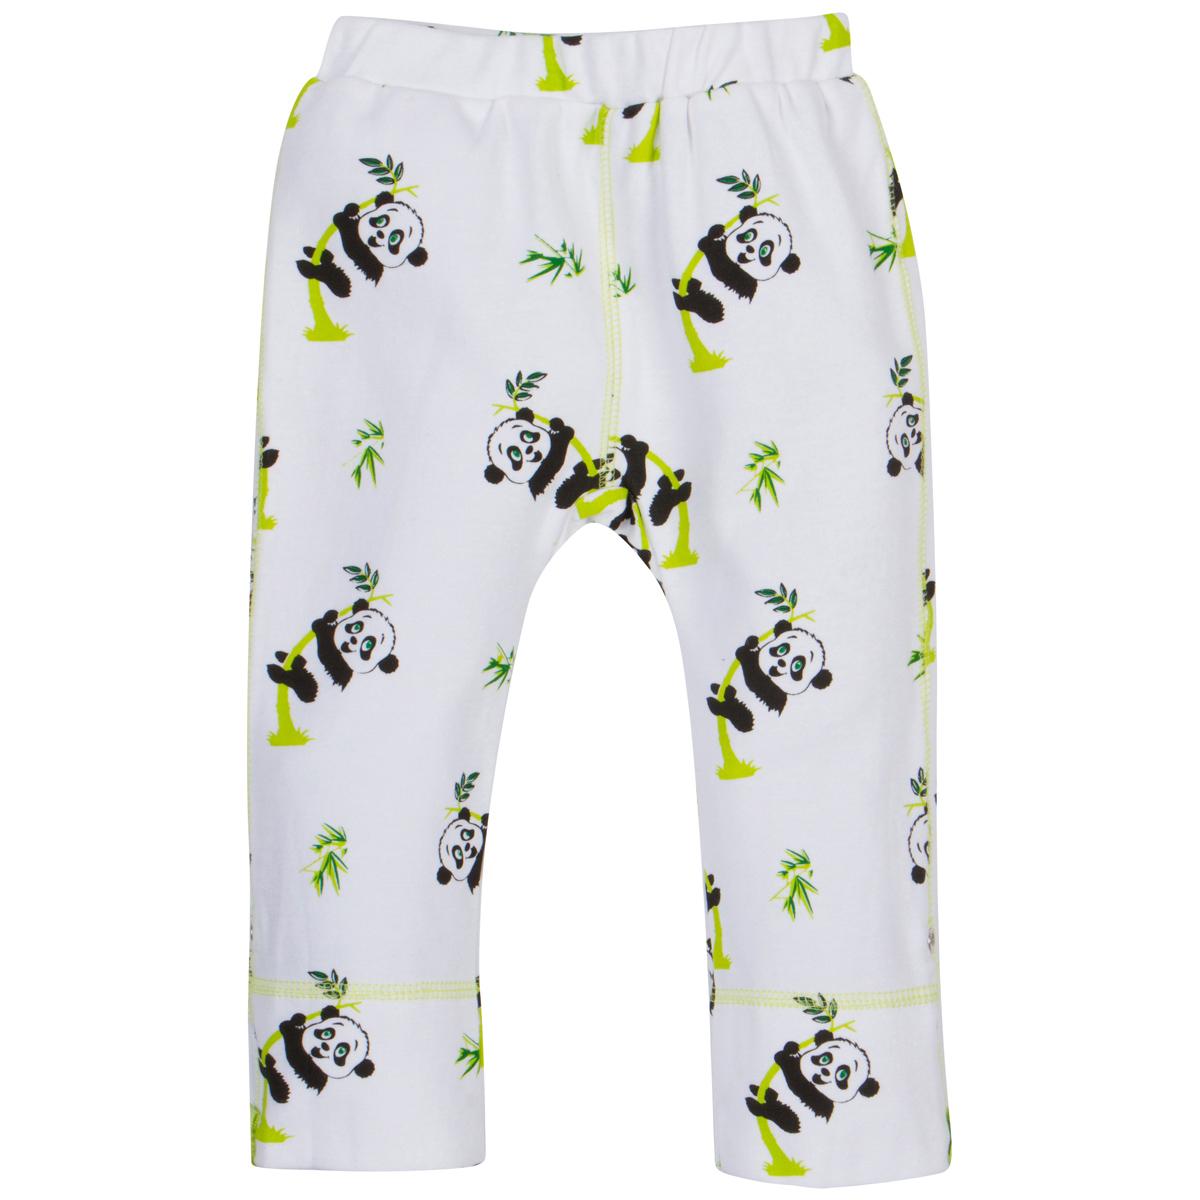 Panda Organic Adjustable Pants